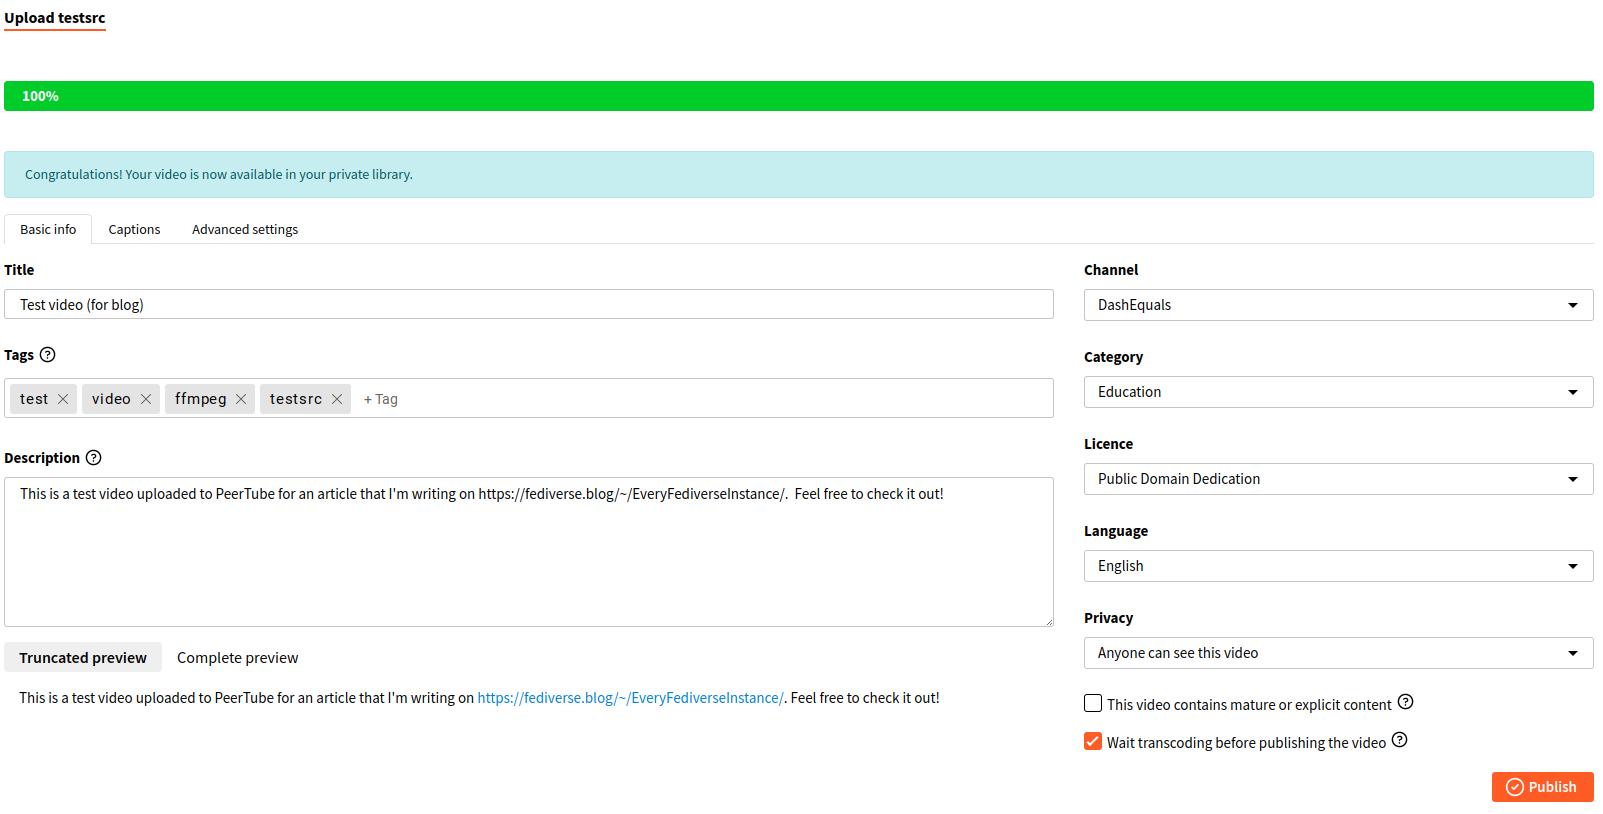 PeerTube video upload screen with metadata filled in